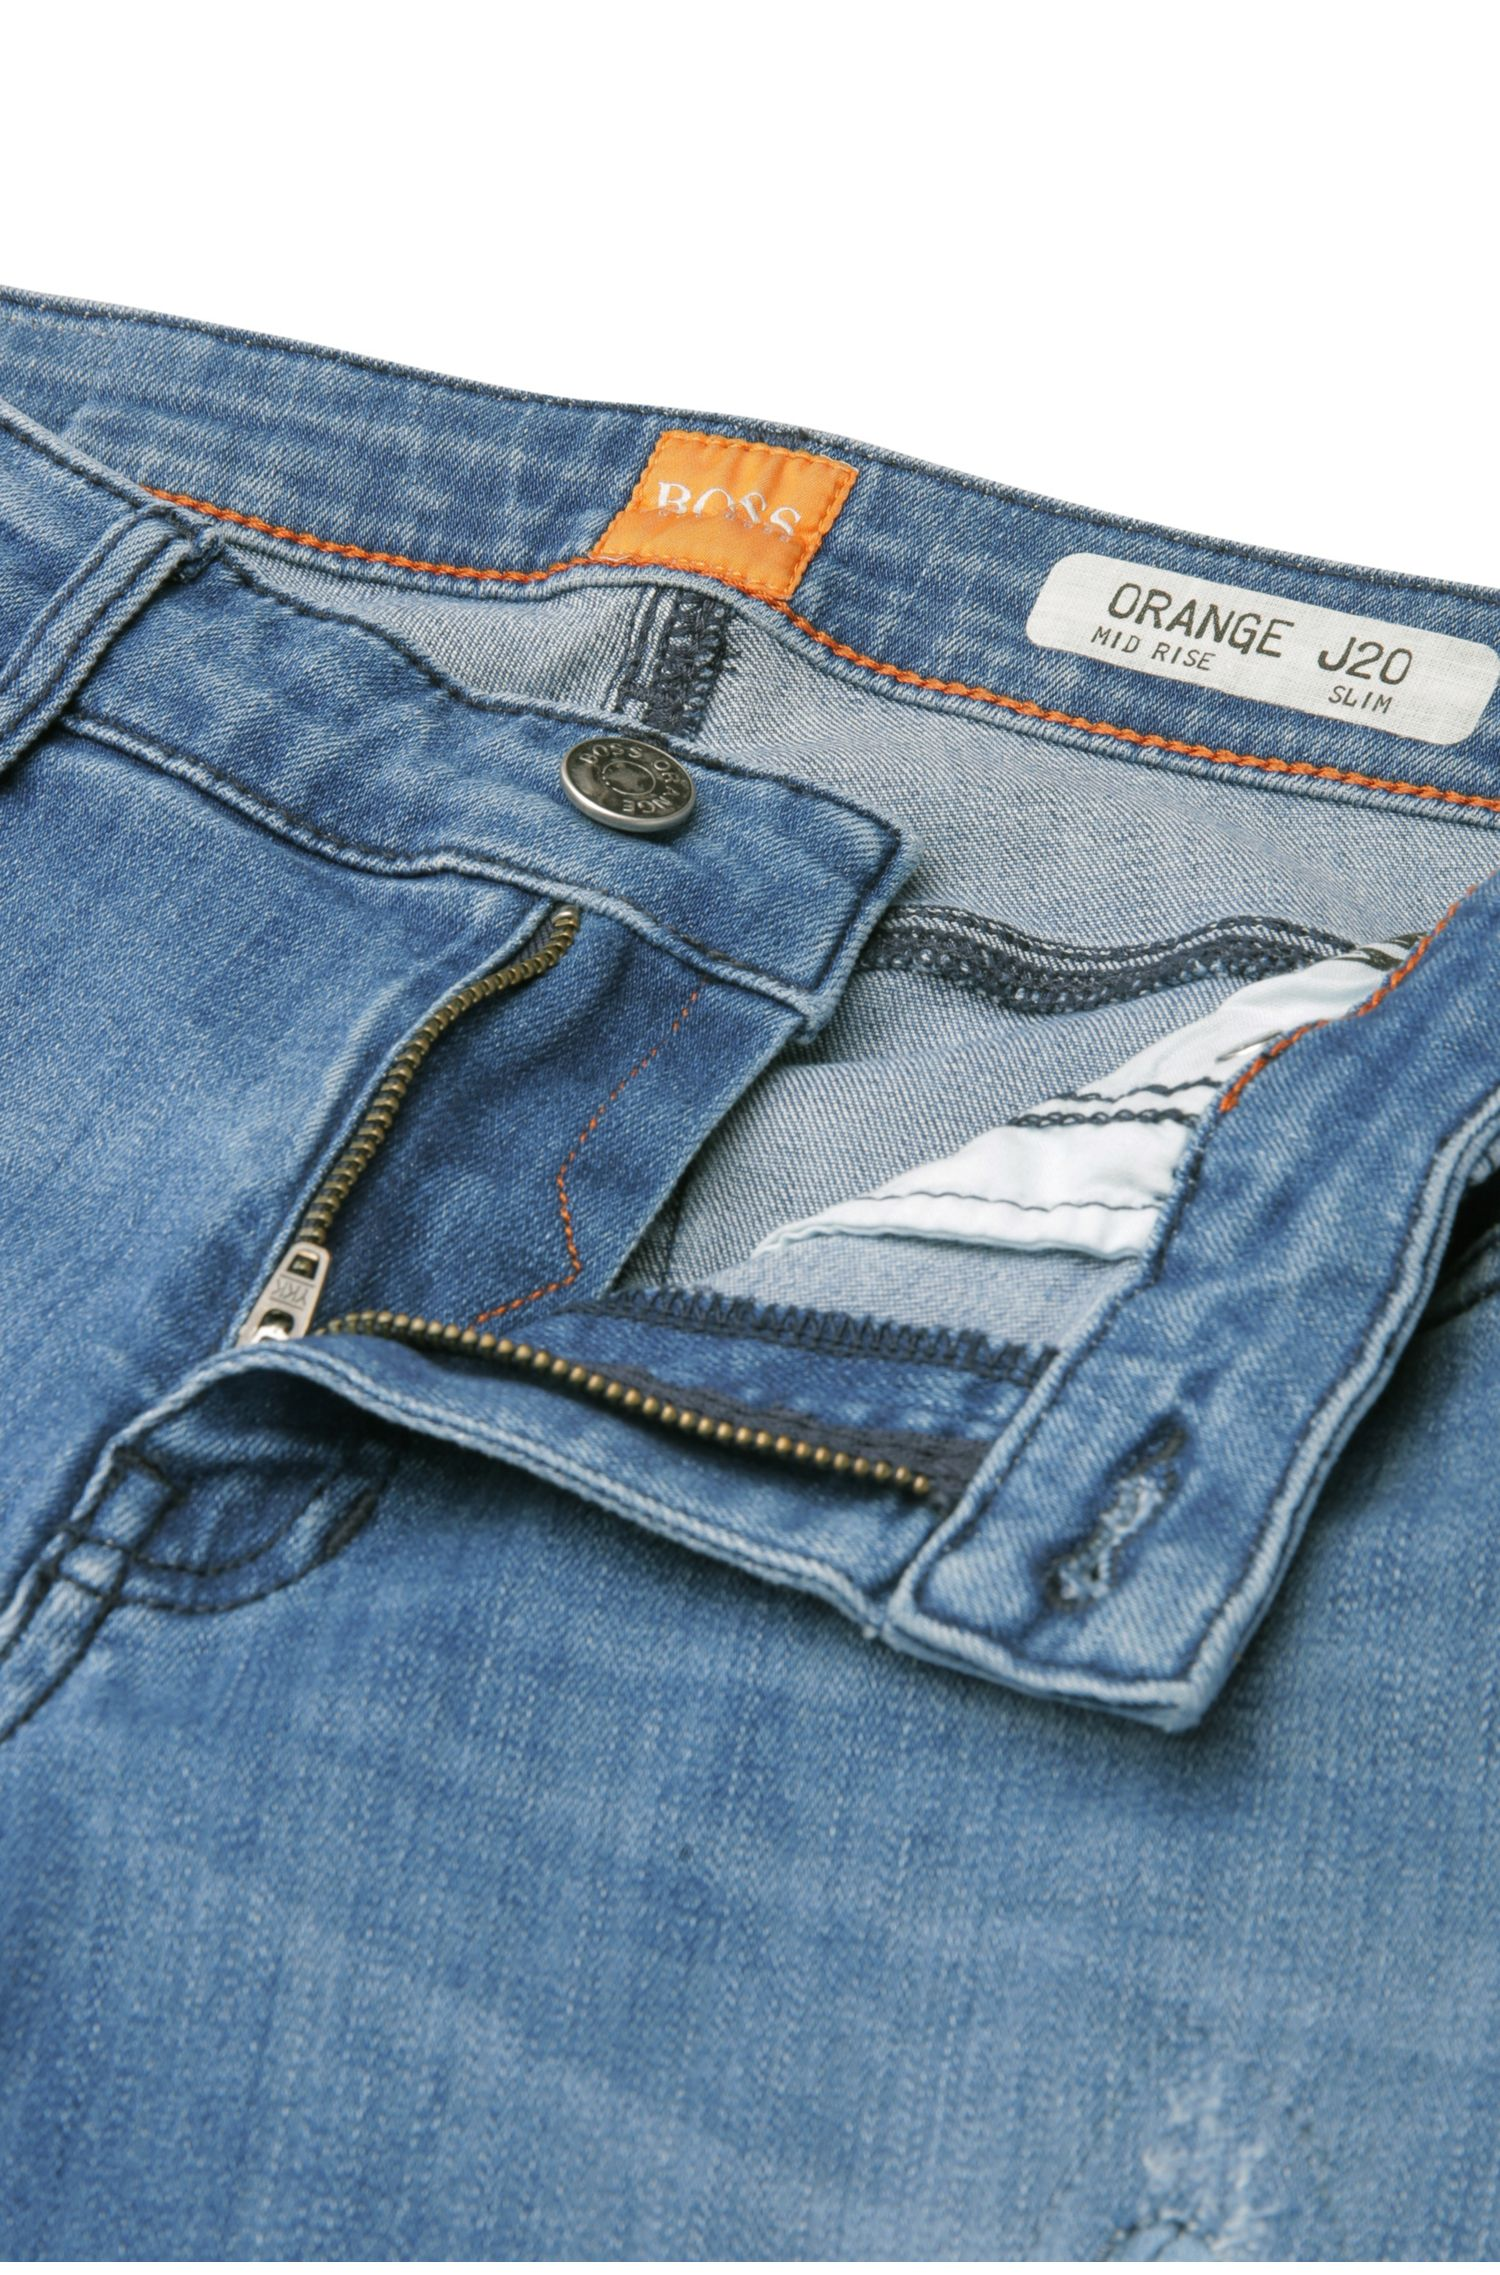 Slim-Fit Jeans aus Baumwolle mit Elasthan: ´Orange J20 Berlin`